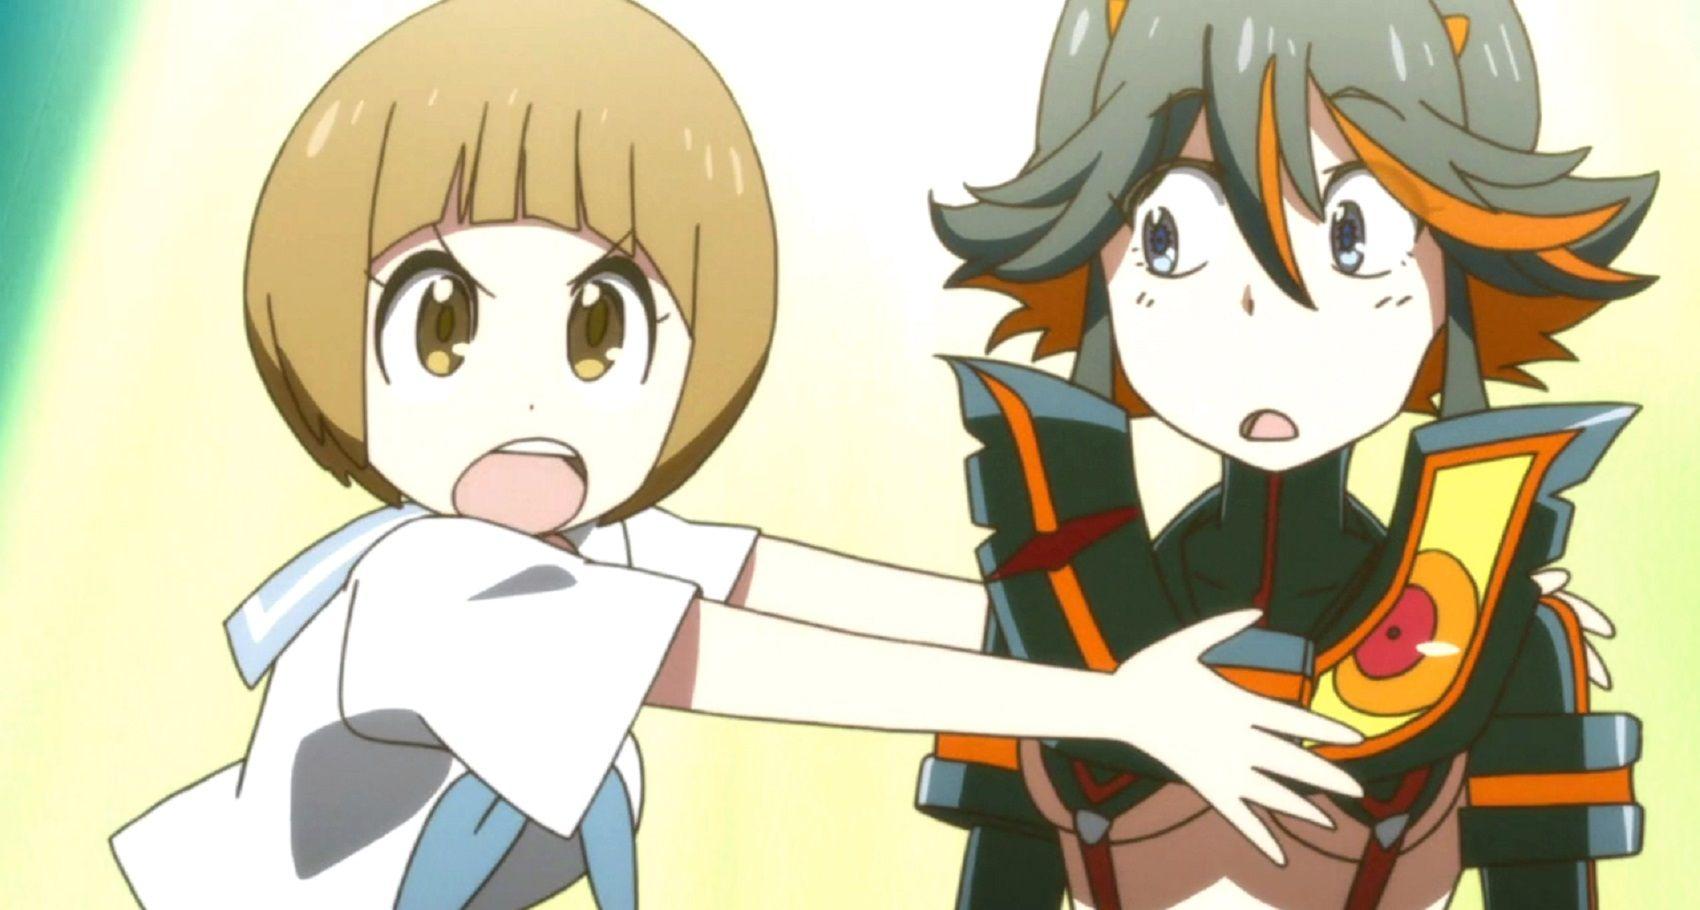 10 Most Amazing Anime Sidekicks | CBR